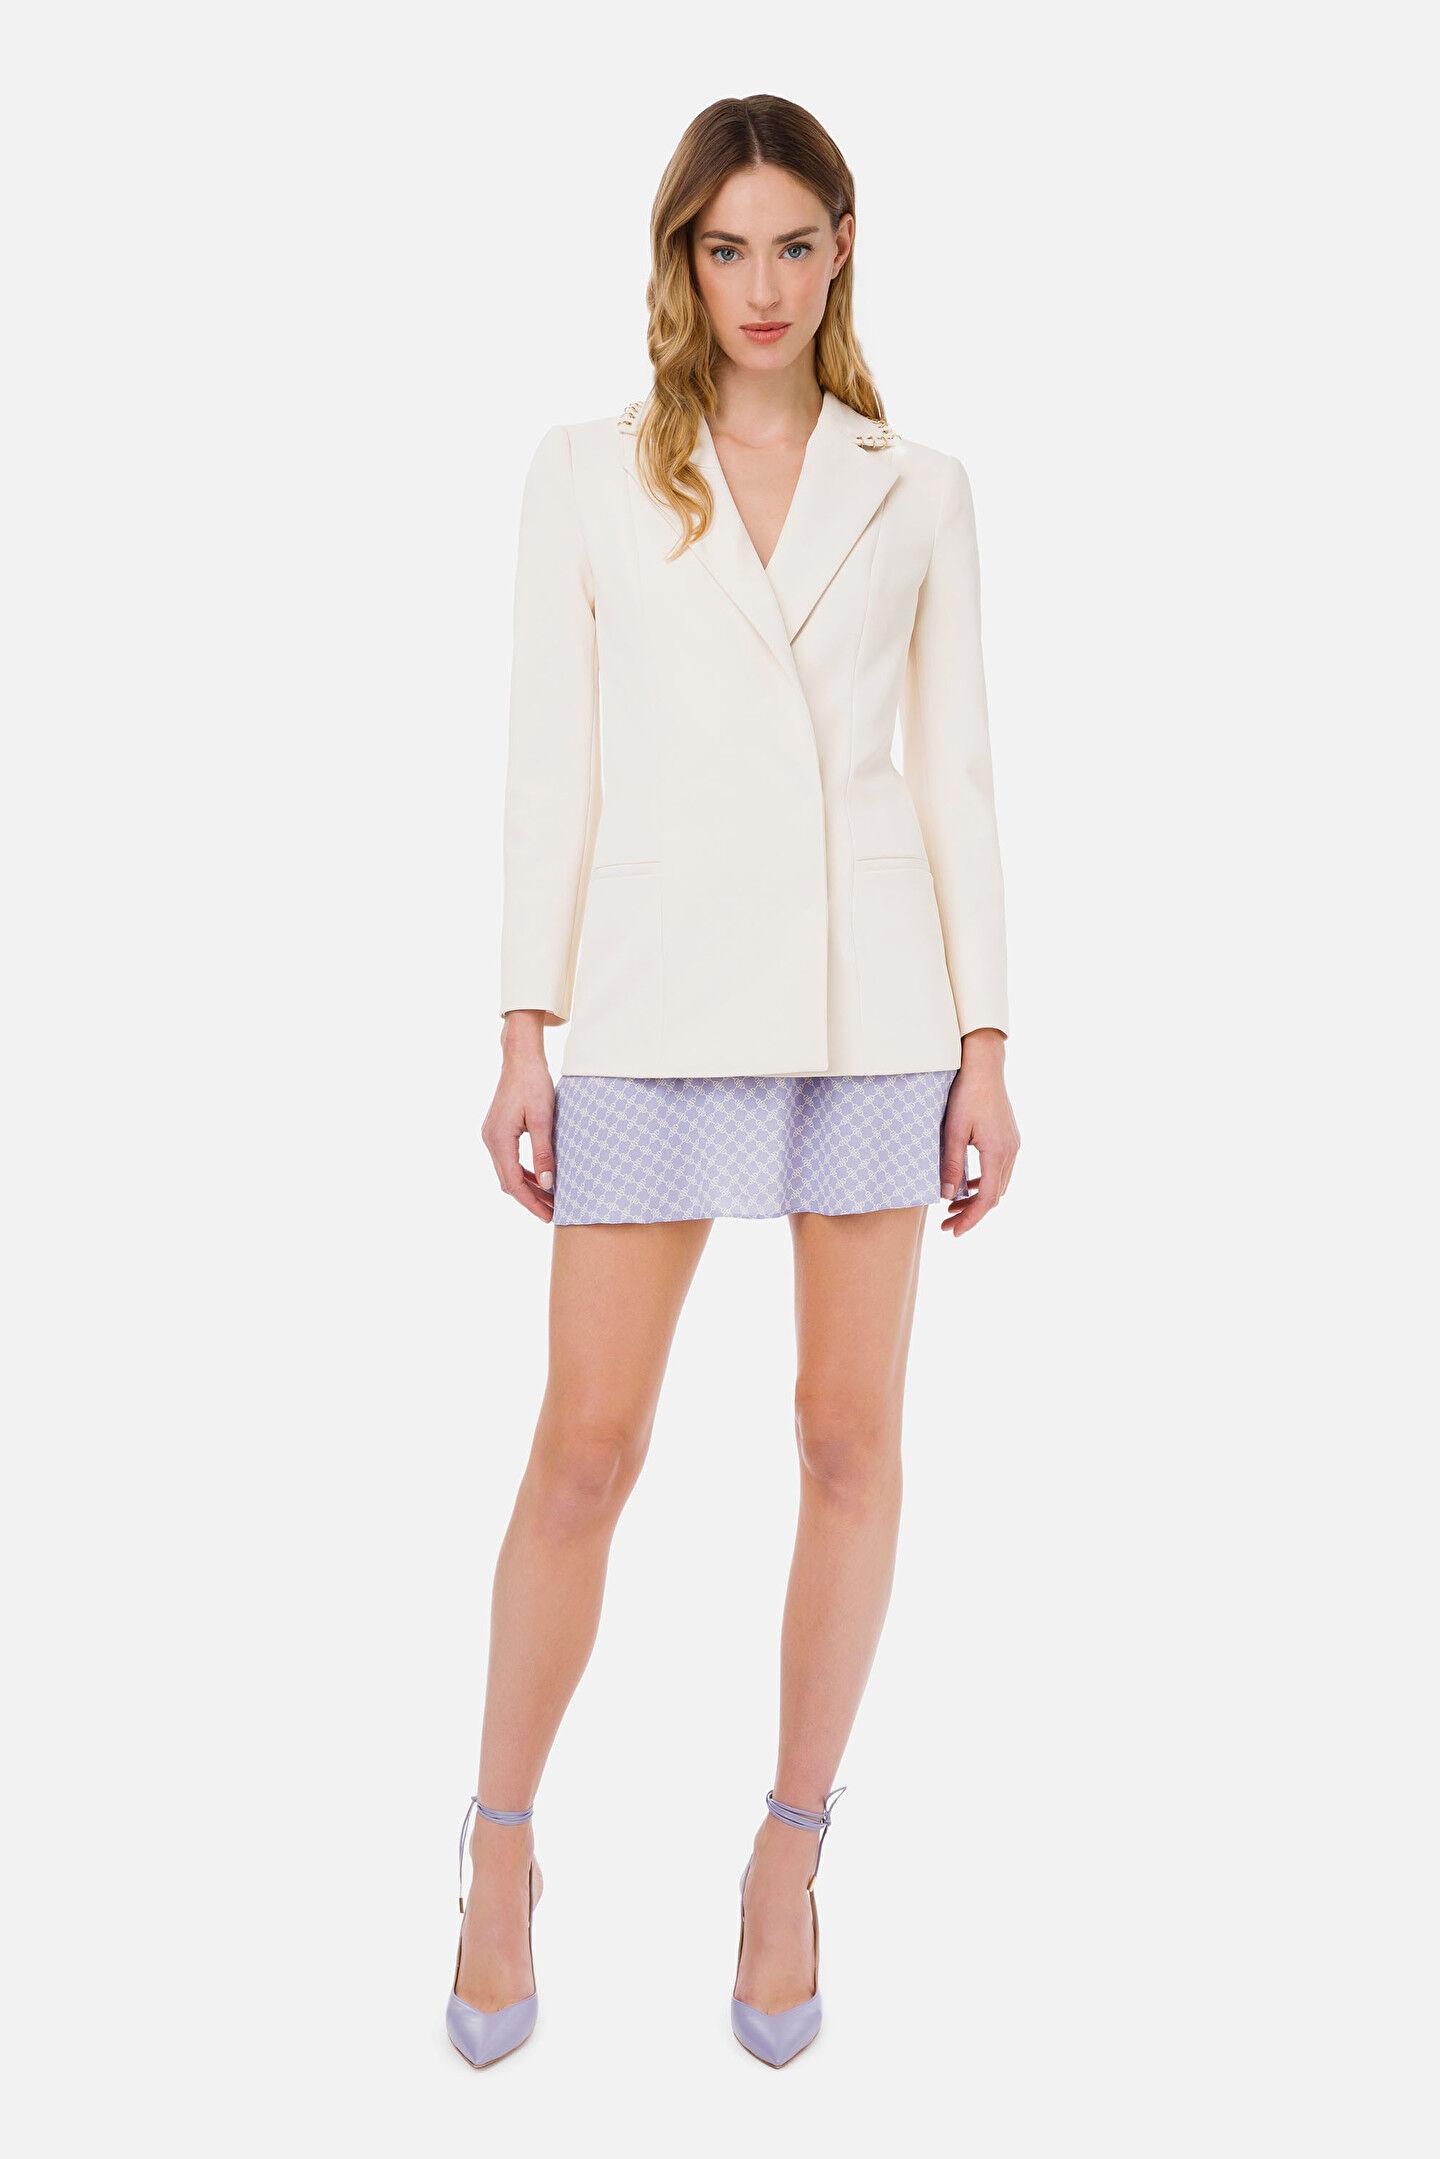 Elisabetta Franchi Jacket With Light Gold Piercing - Elisabetta Franchi